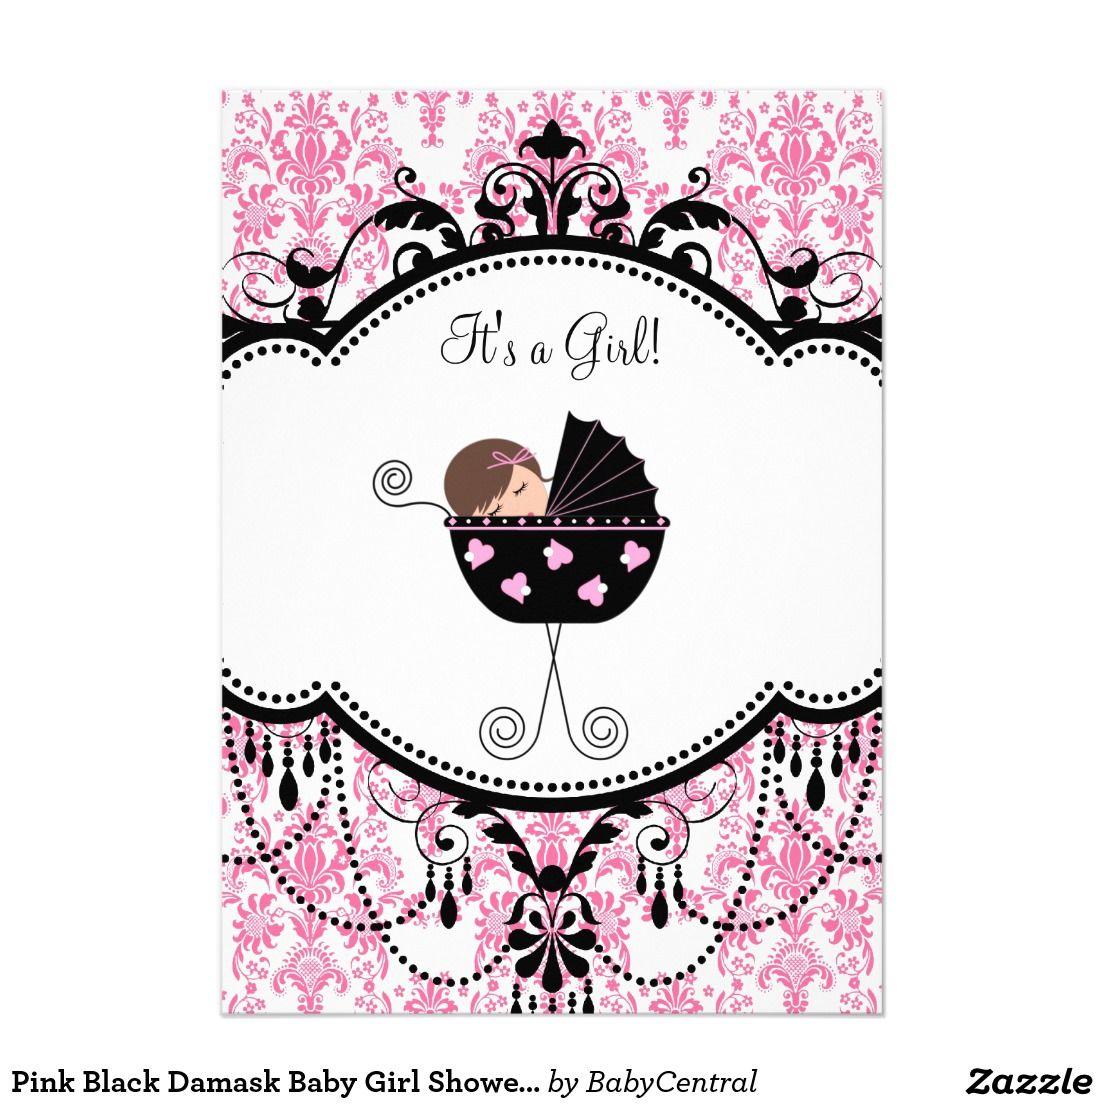 Pink Black Damask Baby Girl Shower Invitations 5\